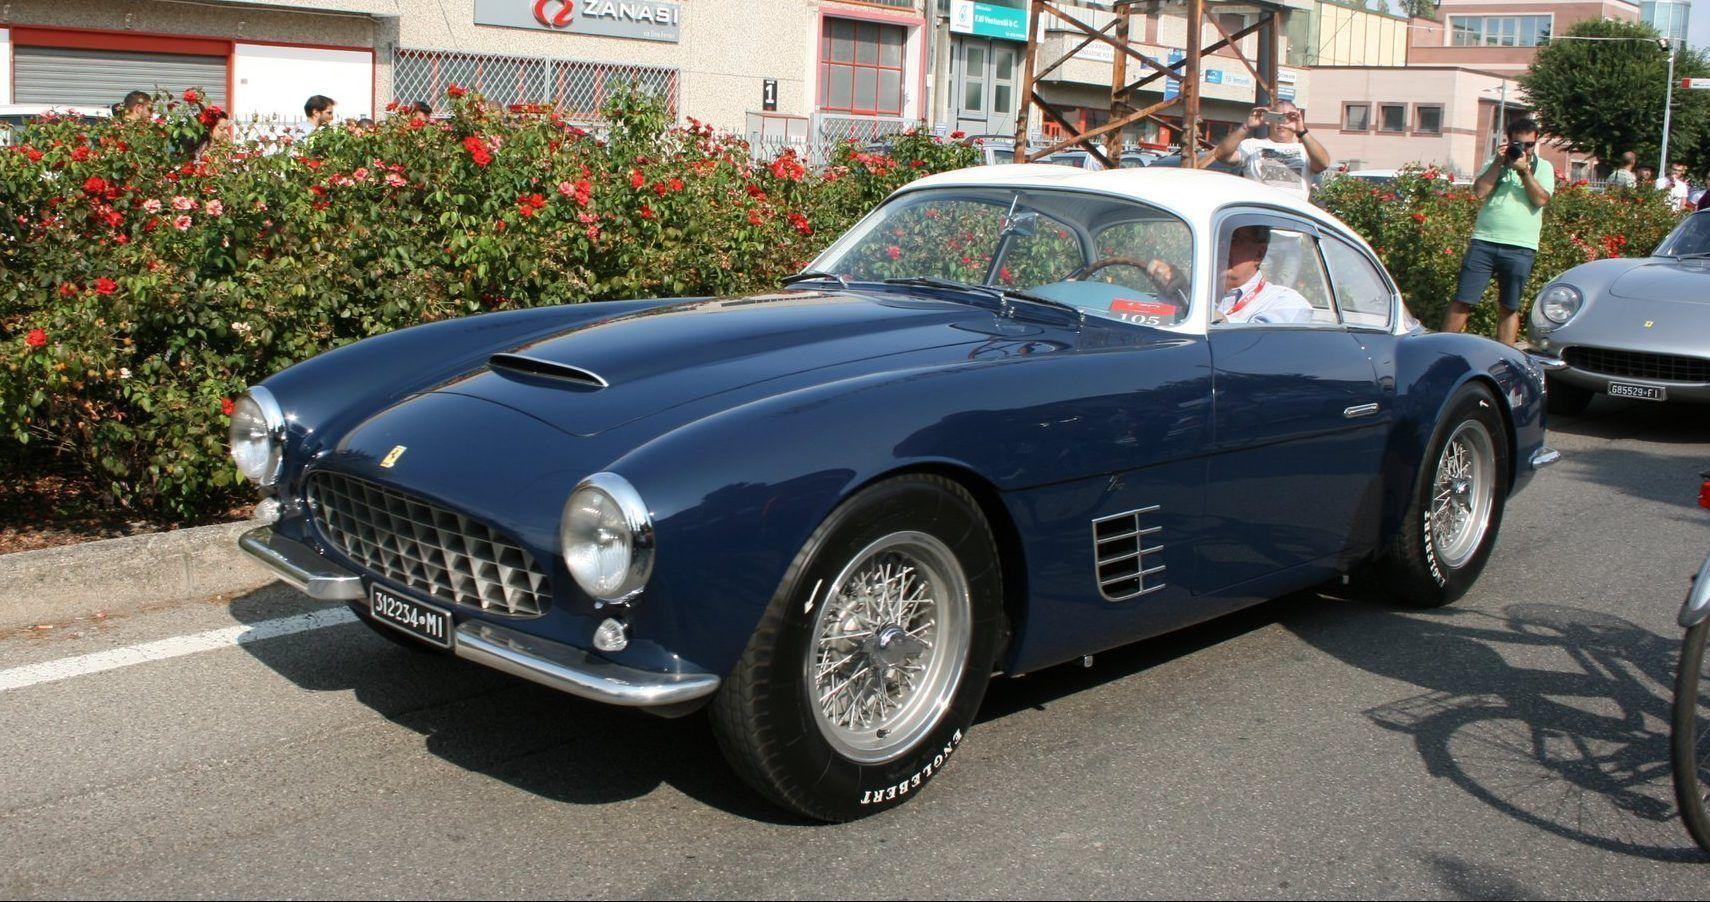 10 Greatest Cars Designed By Zagato | HotCars